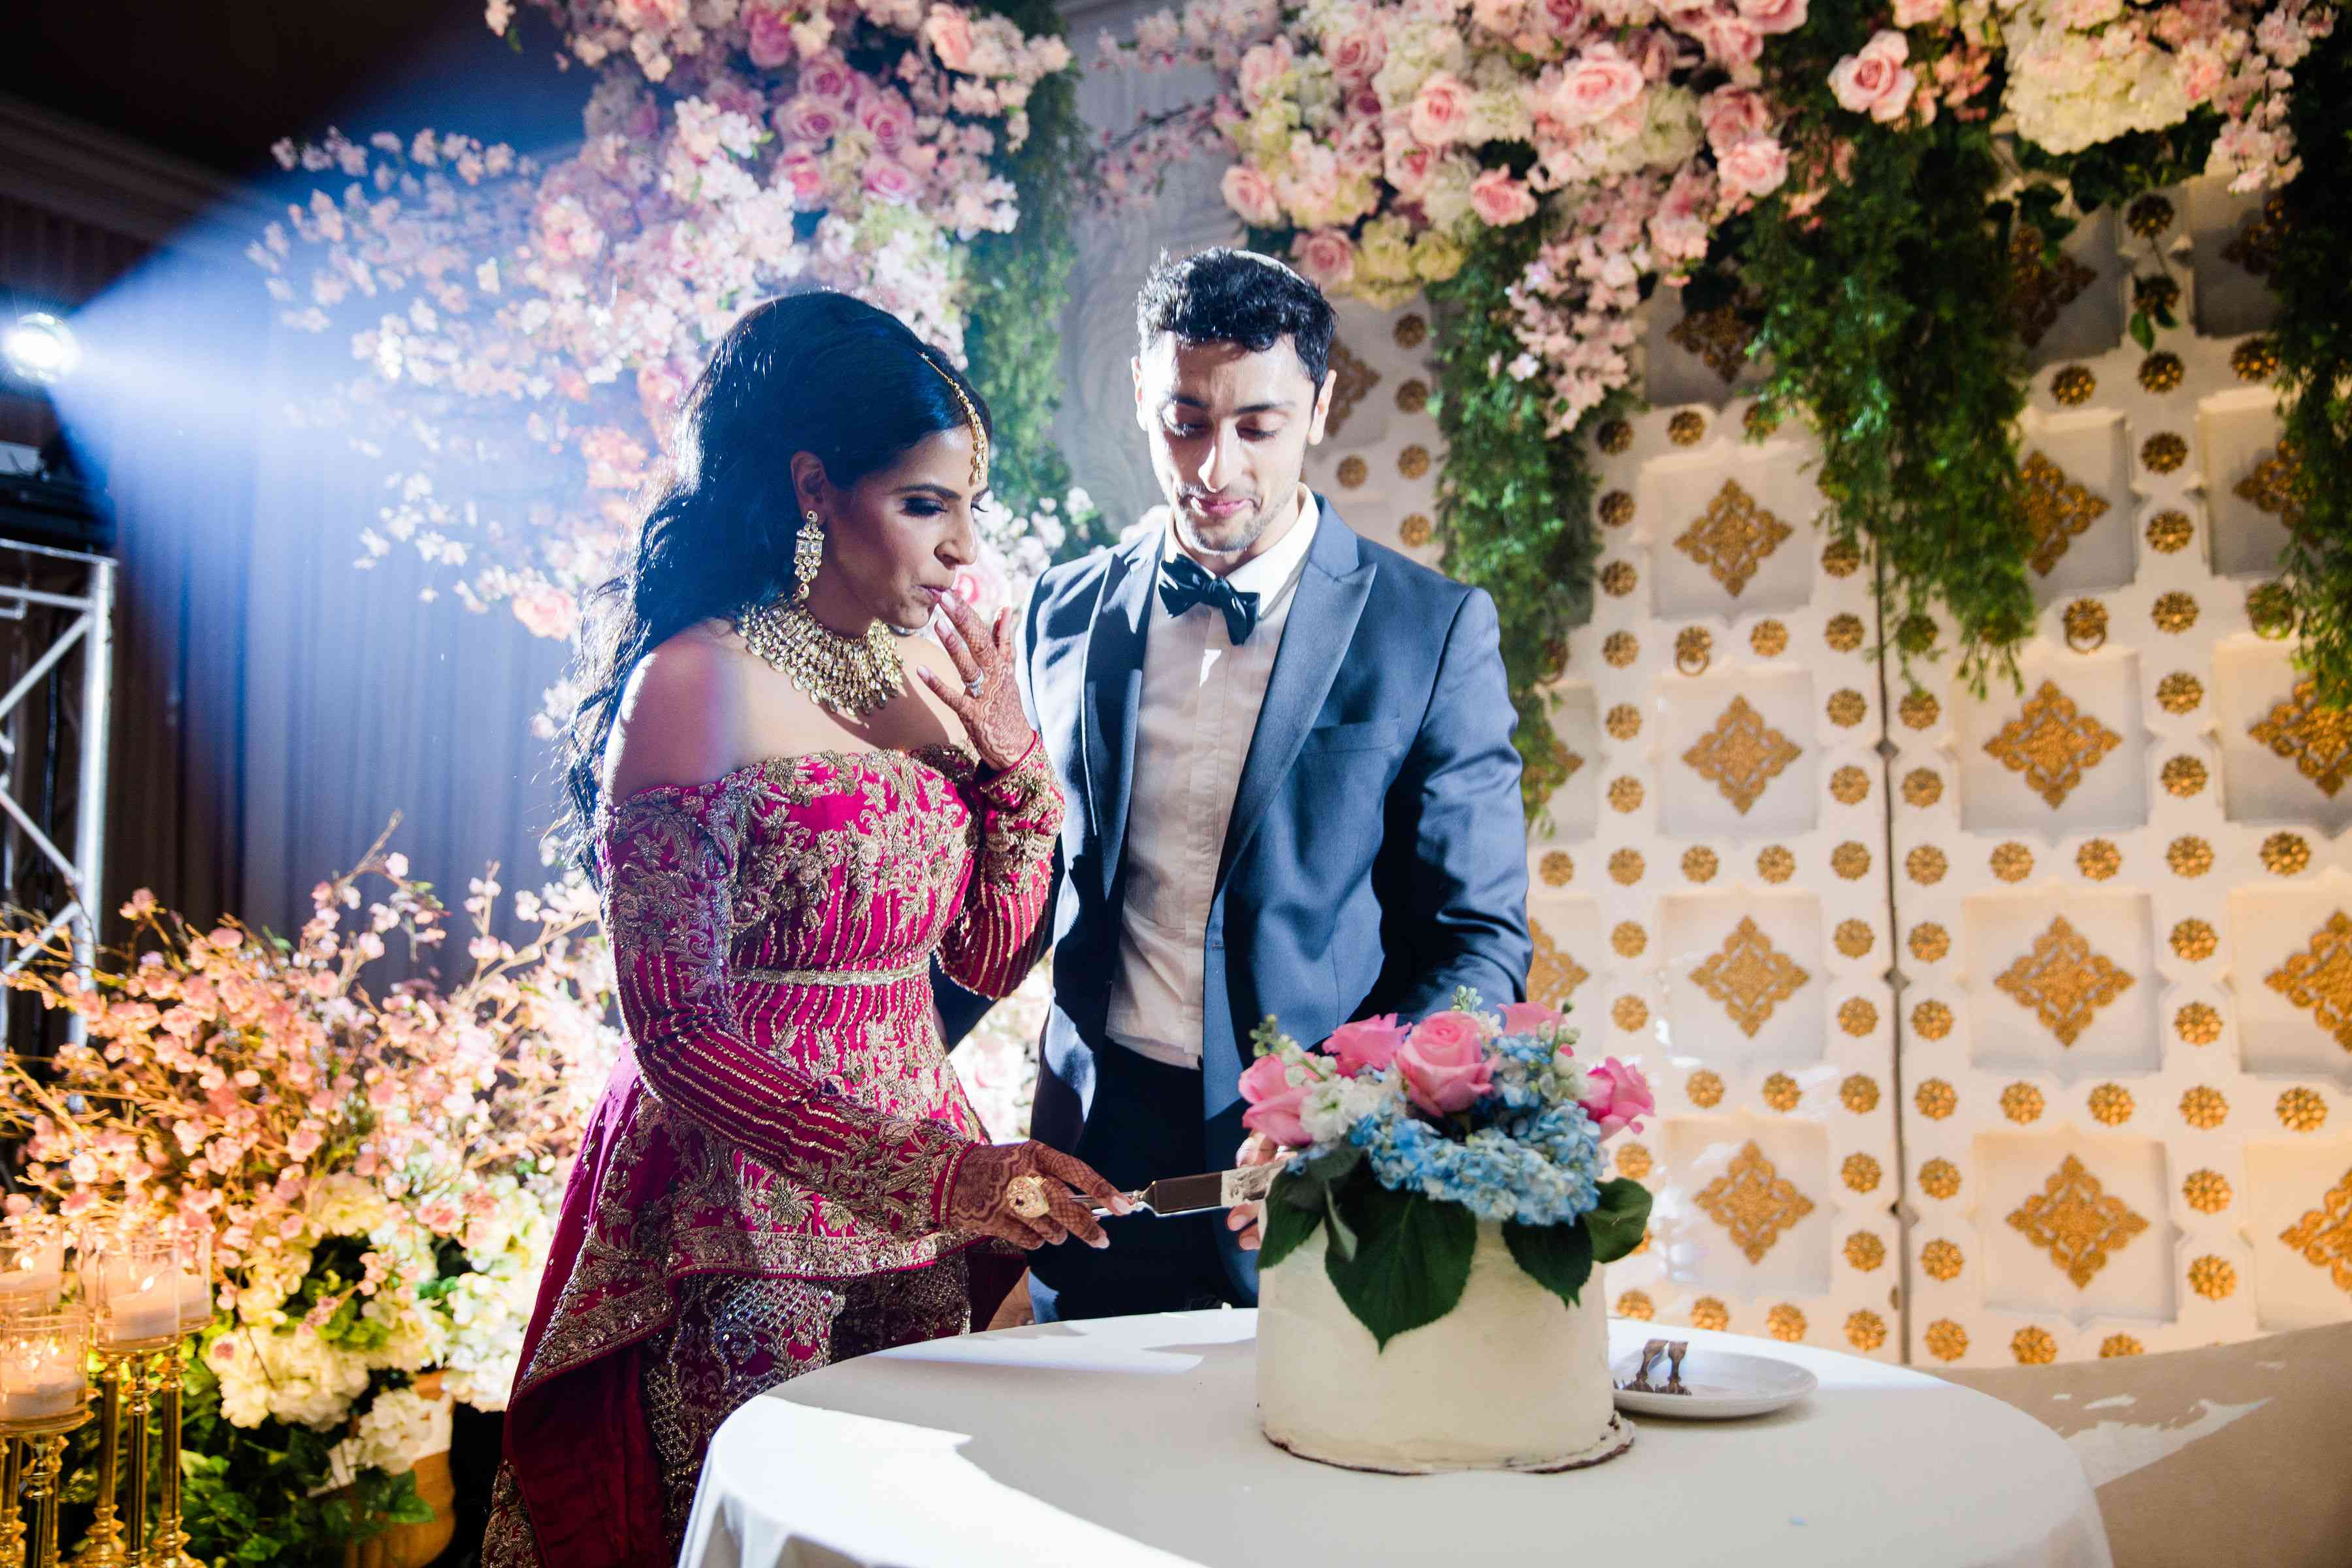 Newlyweds cutting cake